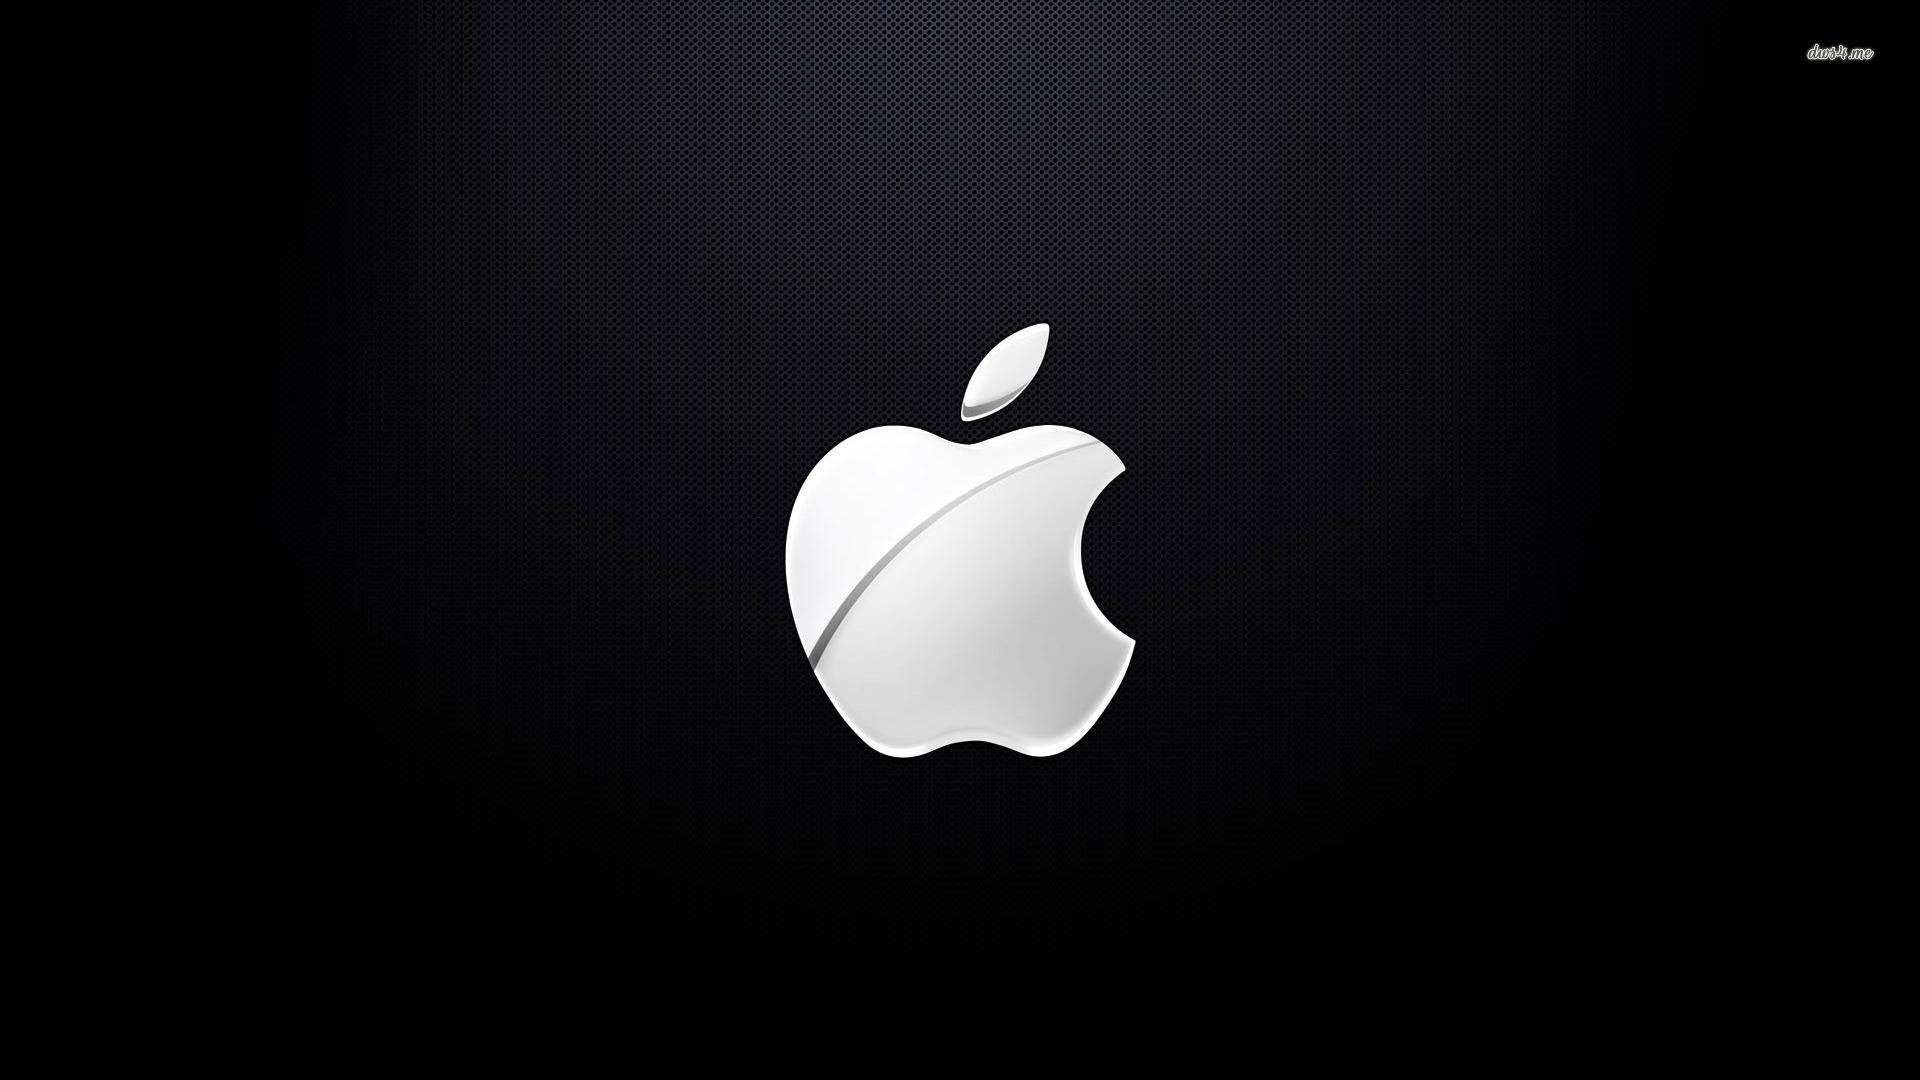 500+ apple logo - latest apple logo, icon, gif, transparent png